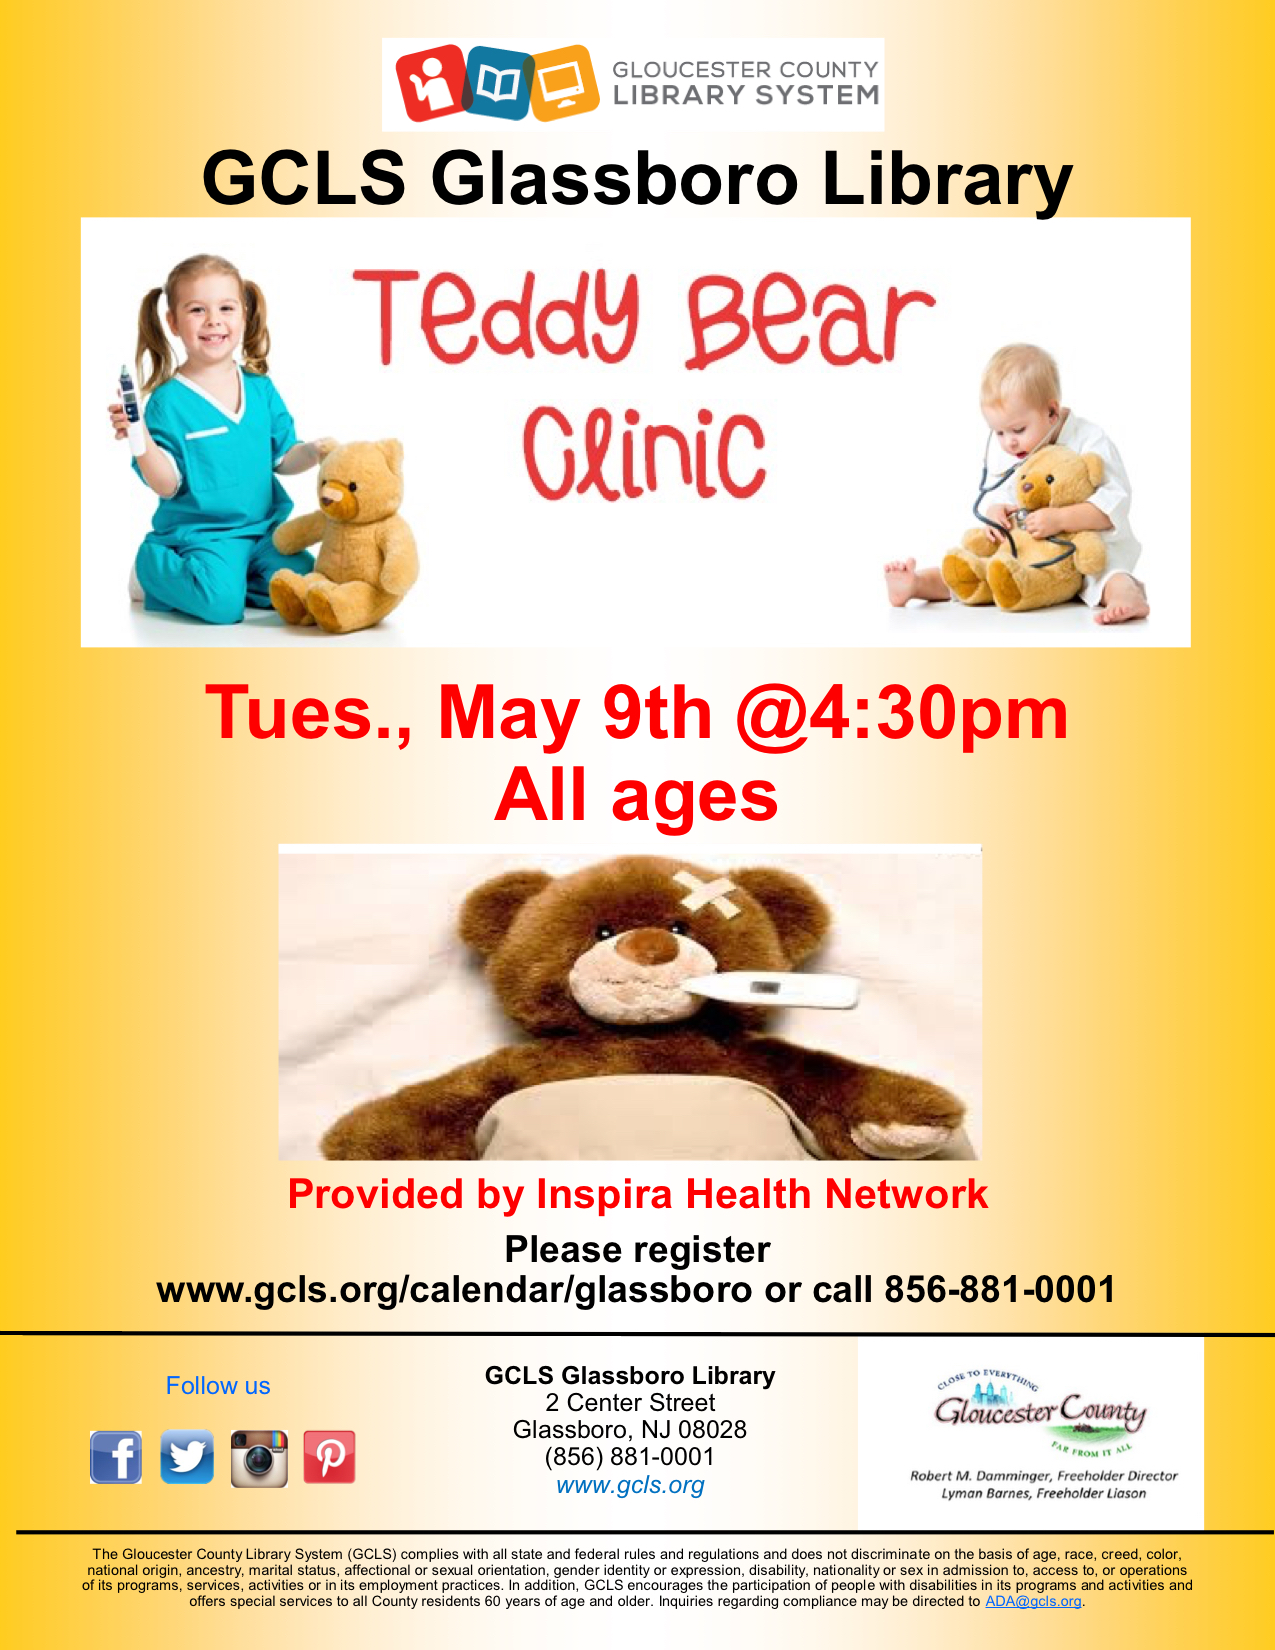 teddy bear clinic glassboro library